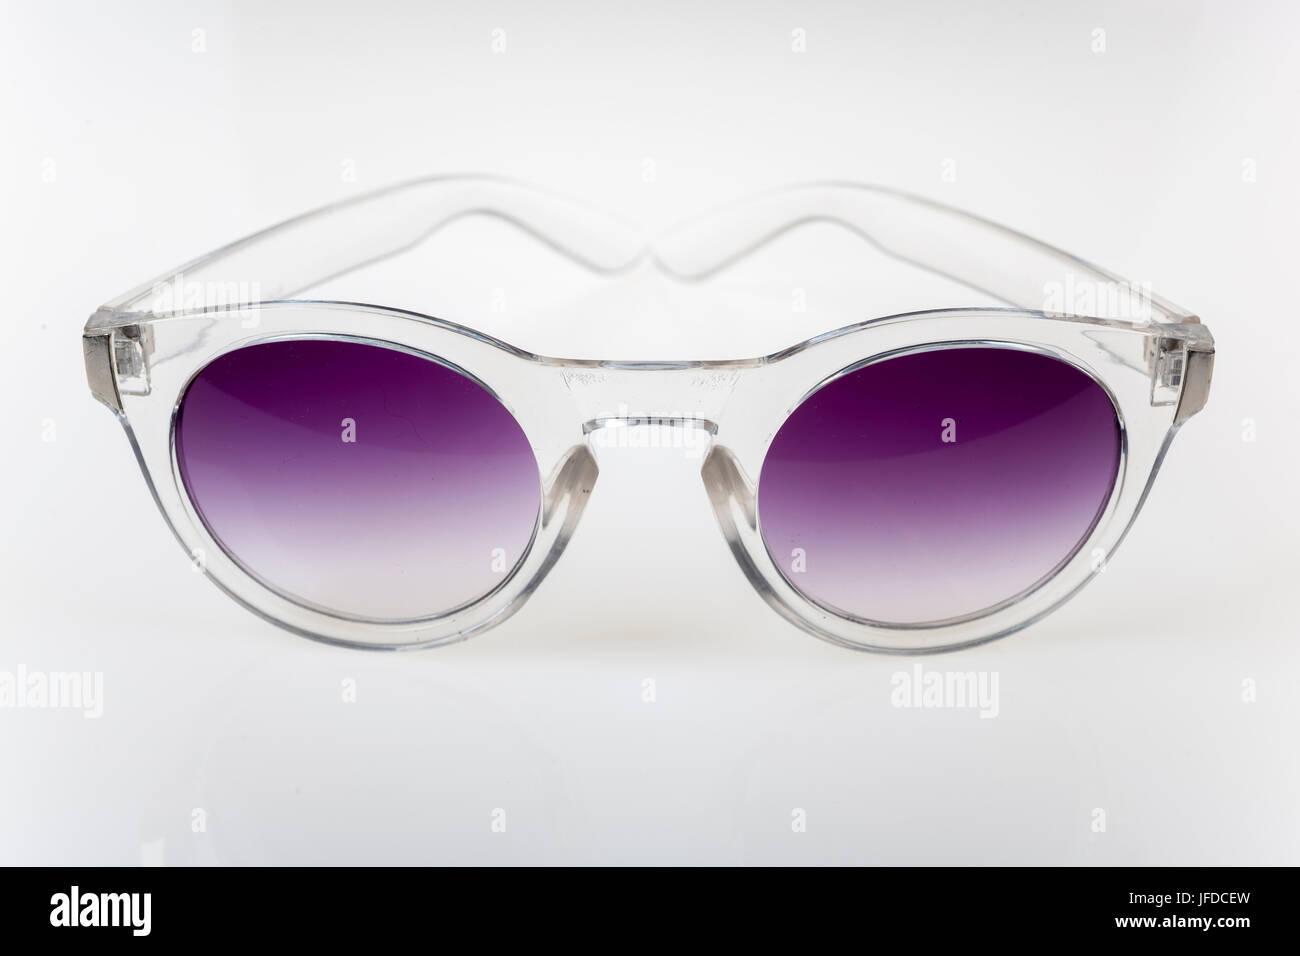 Close-up view on eyeglasses on white background - Stock Image